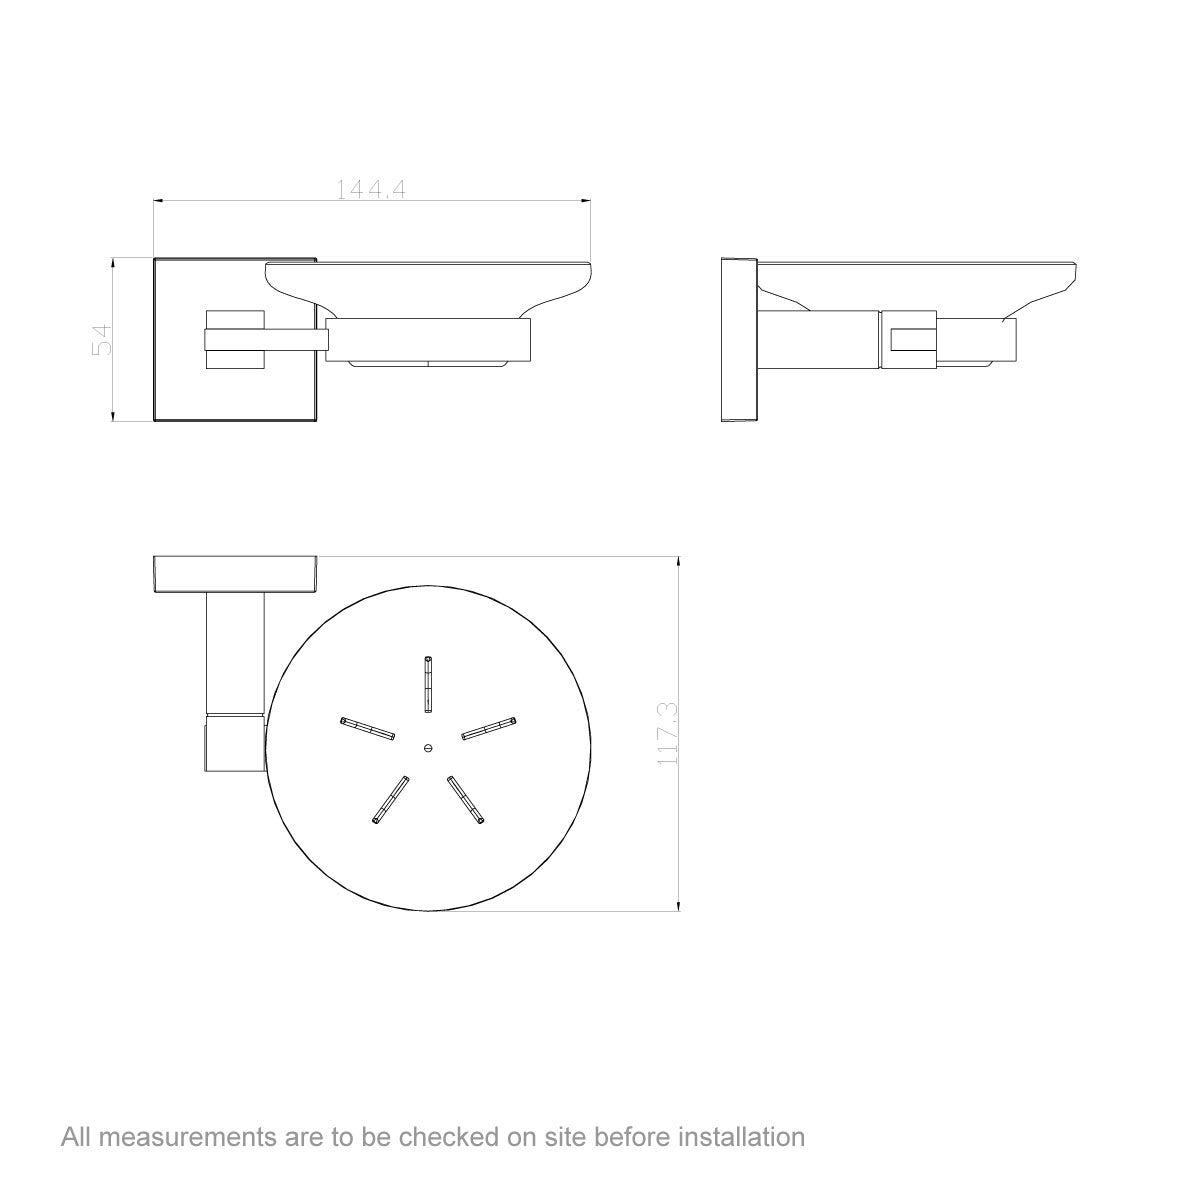 Dimensions for Orchard Flex soap dish